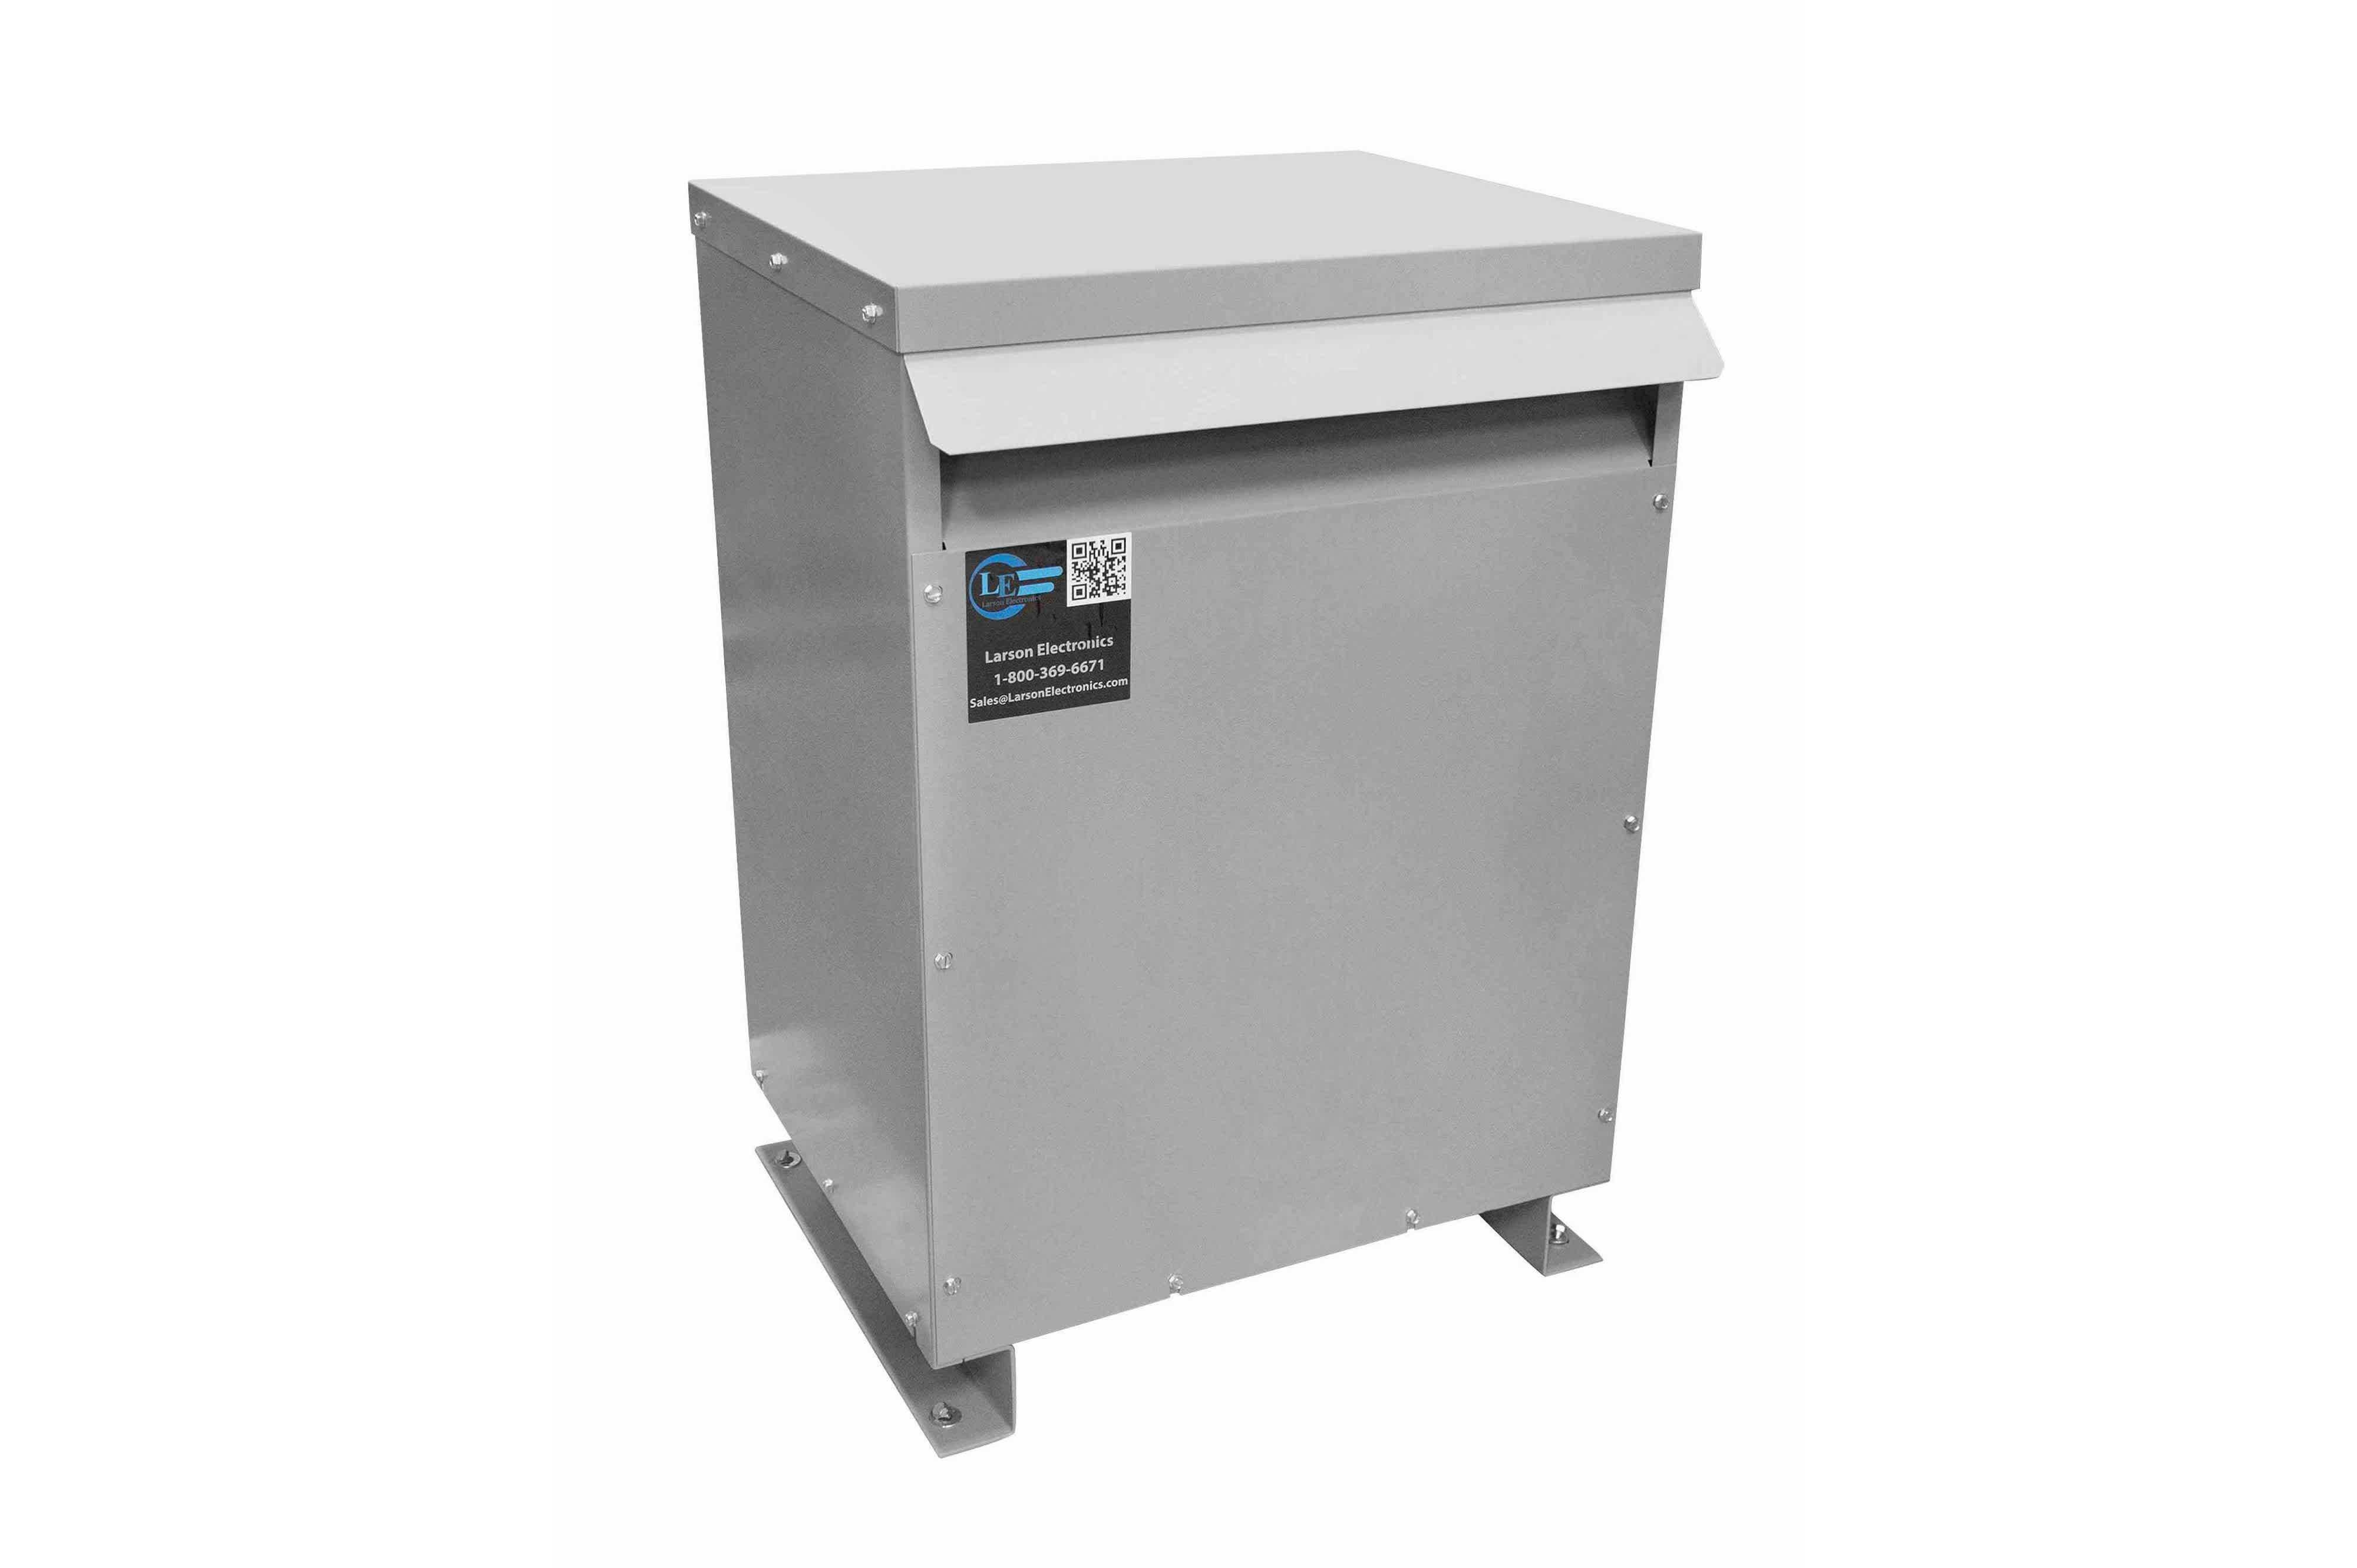 22.5 kVA 3PH Isolation Transformer, 400V Wye Primary, 208Y/120 Wye-N Secondary, N3R, Ventilated, 60 Hz